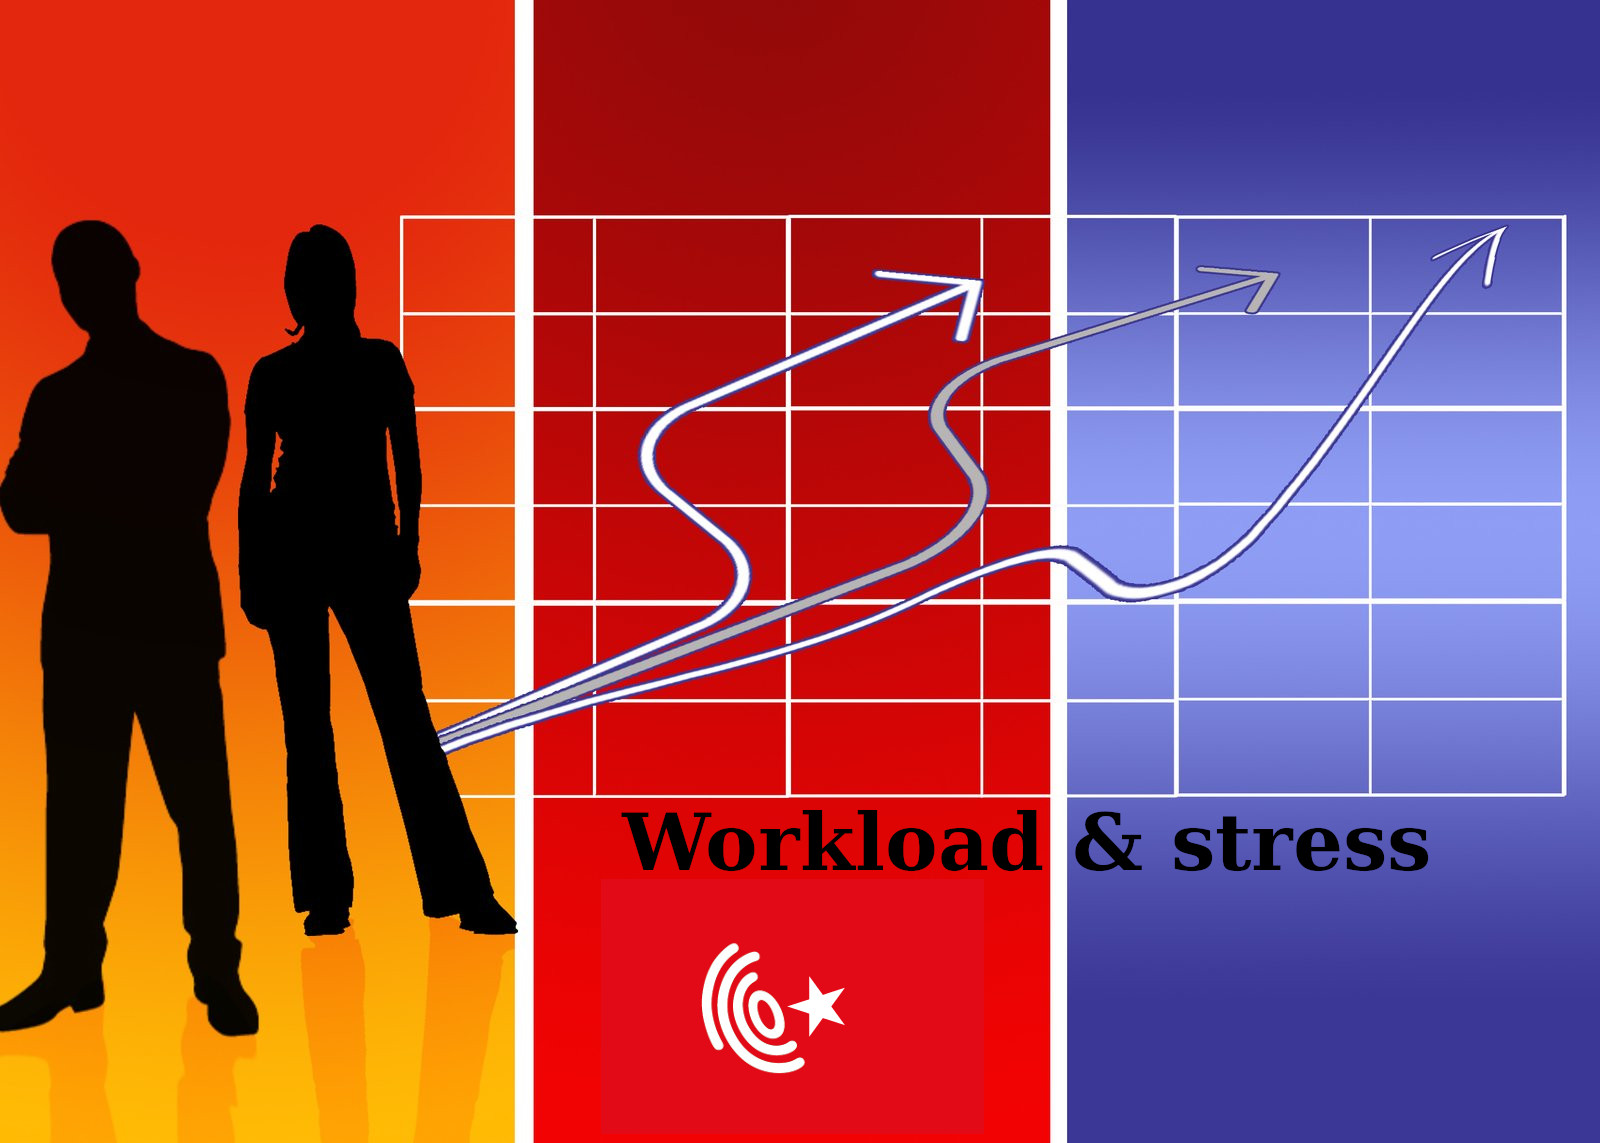 Workload & stress